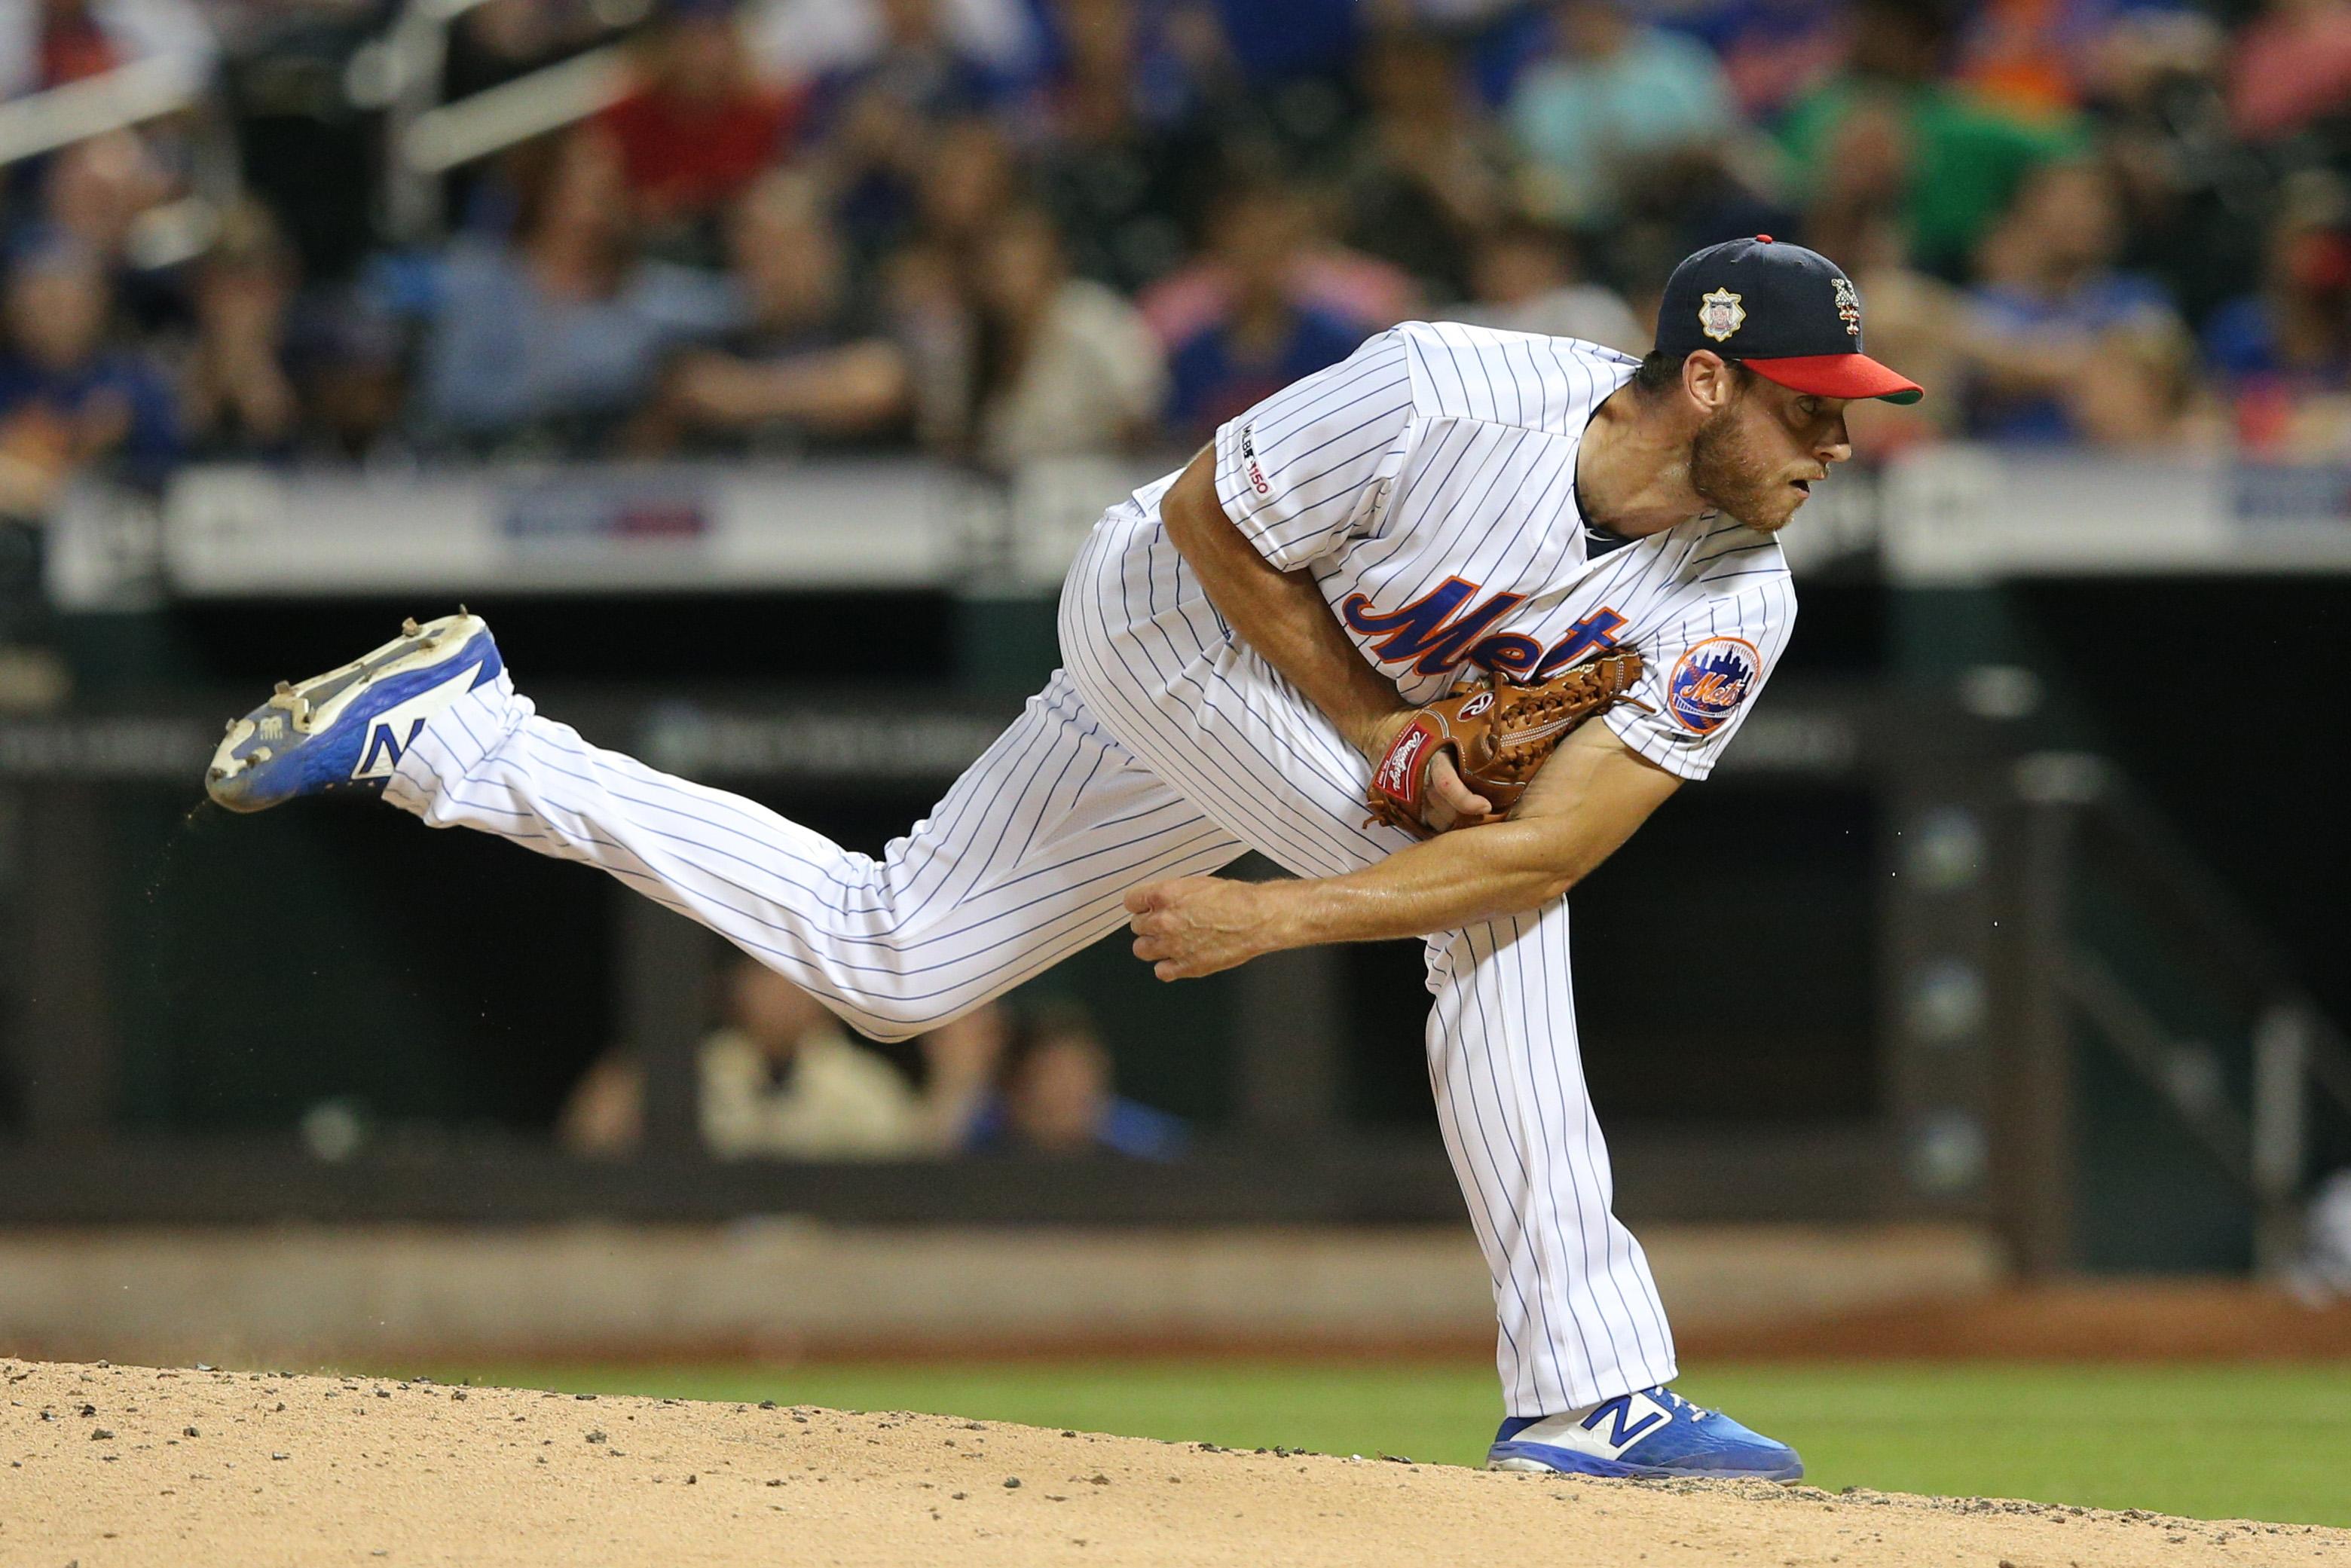 New York Mets' second half rotation features return of Steven Matz